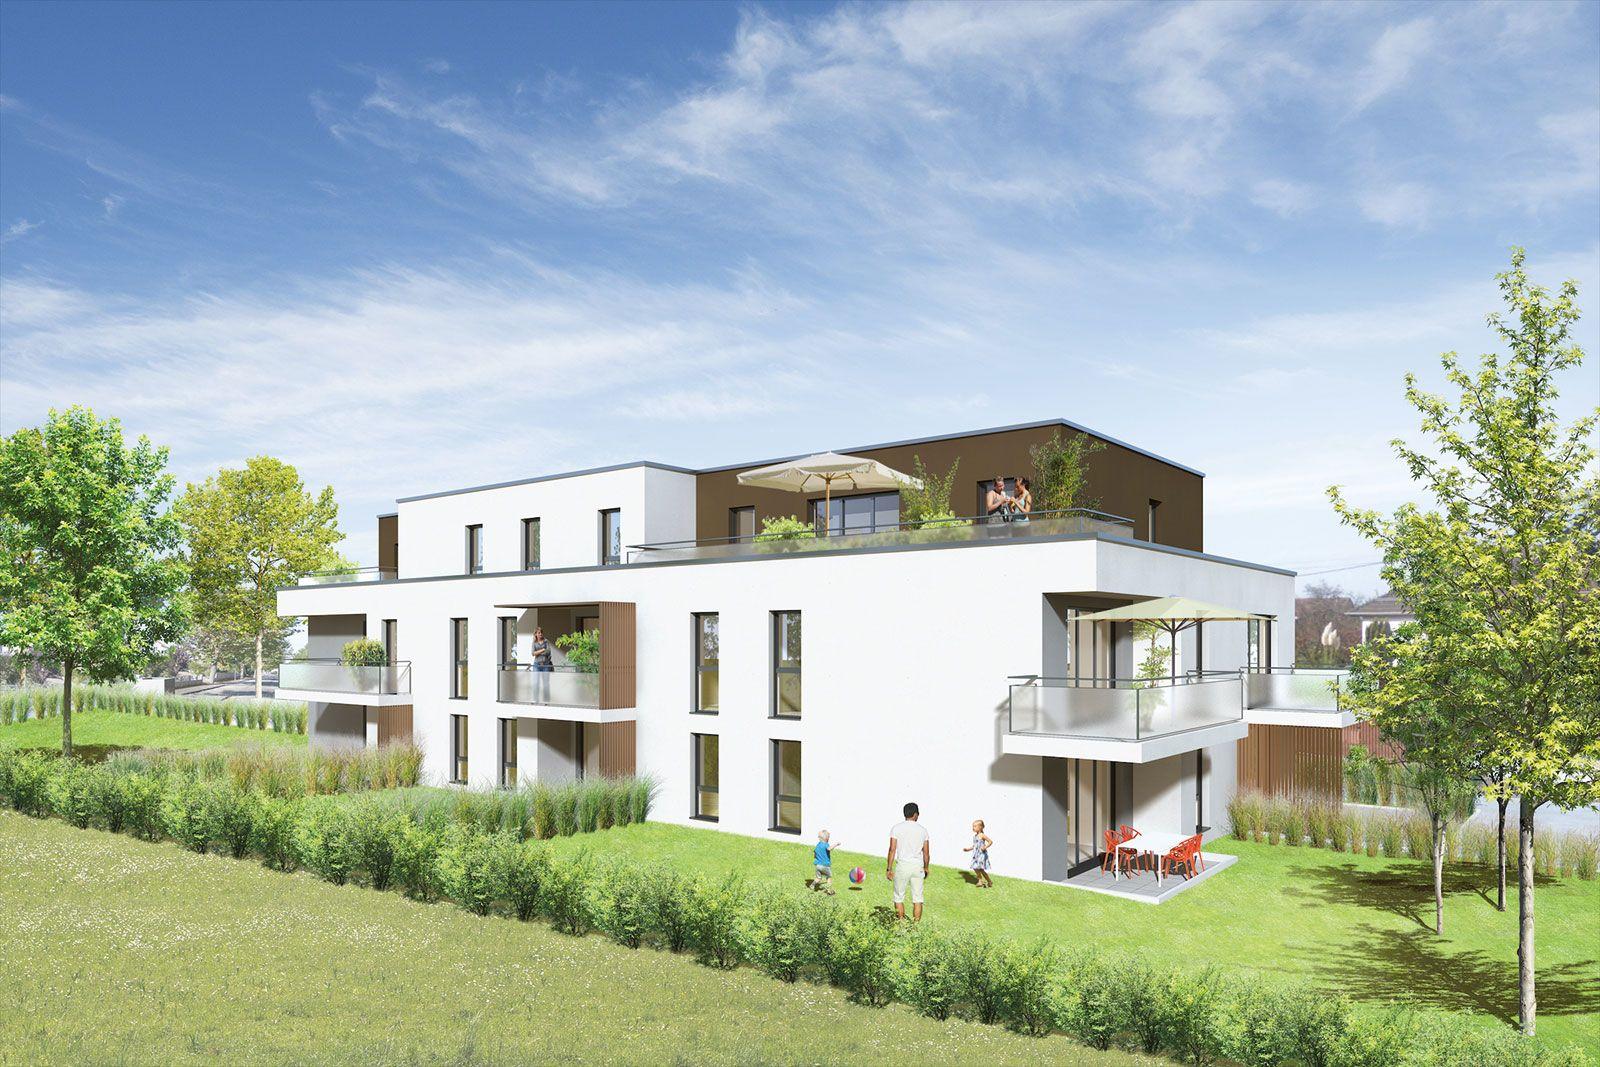 appartement neuf blotzheim|appart neuf blotzheim|résidence neuve blotzheim